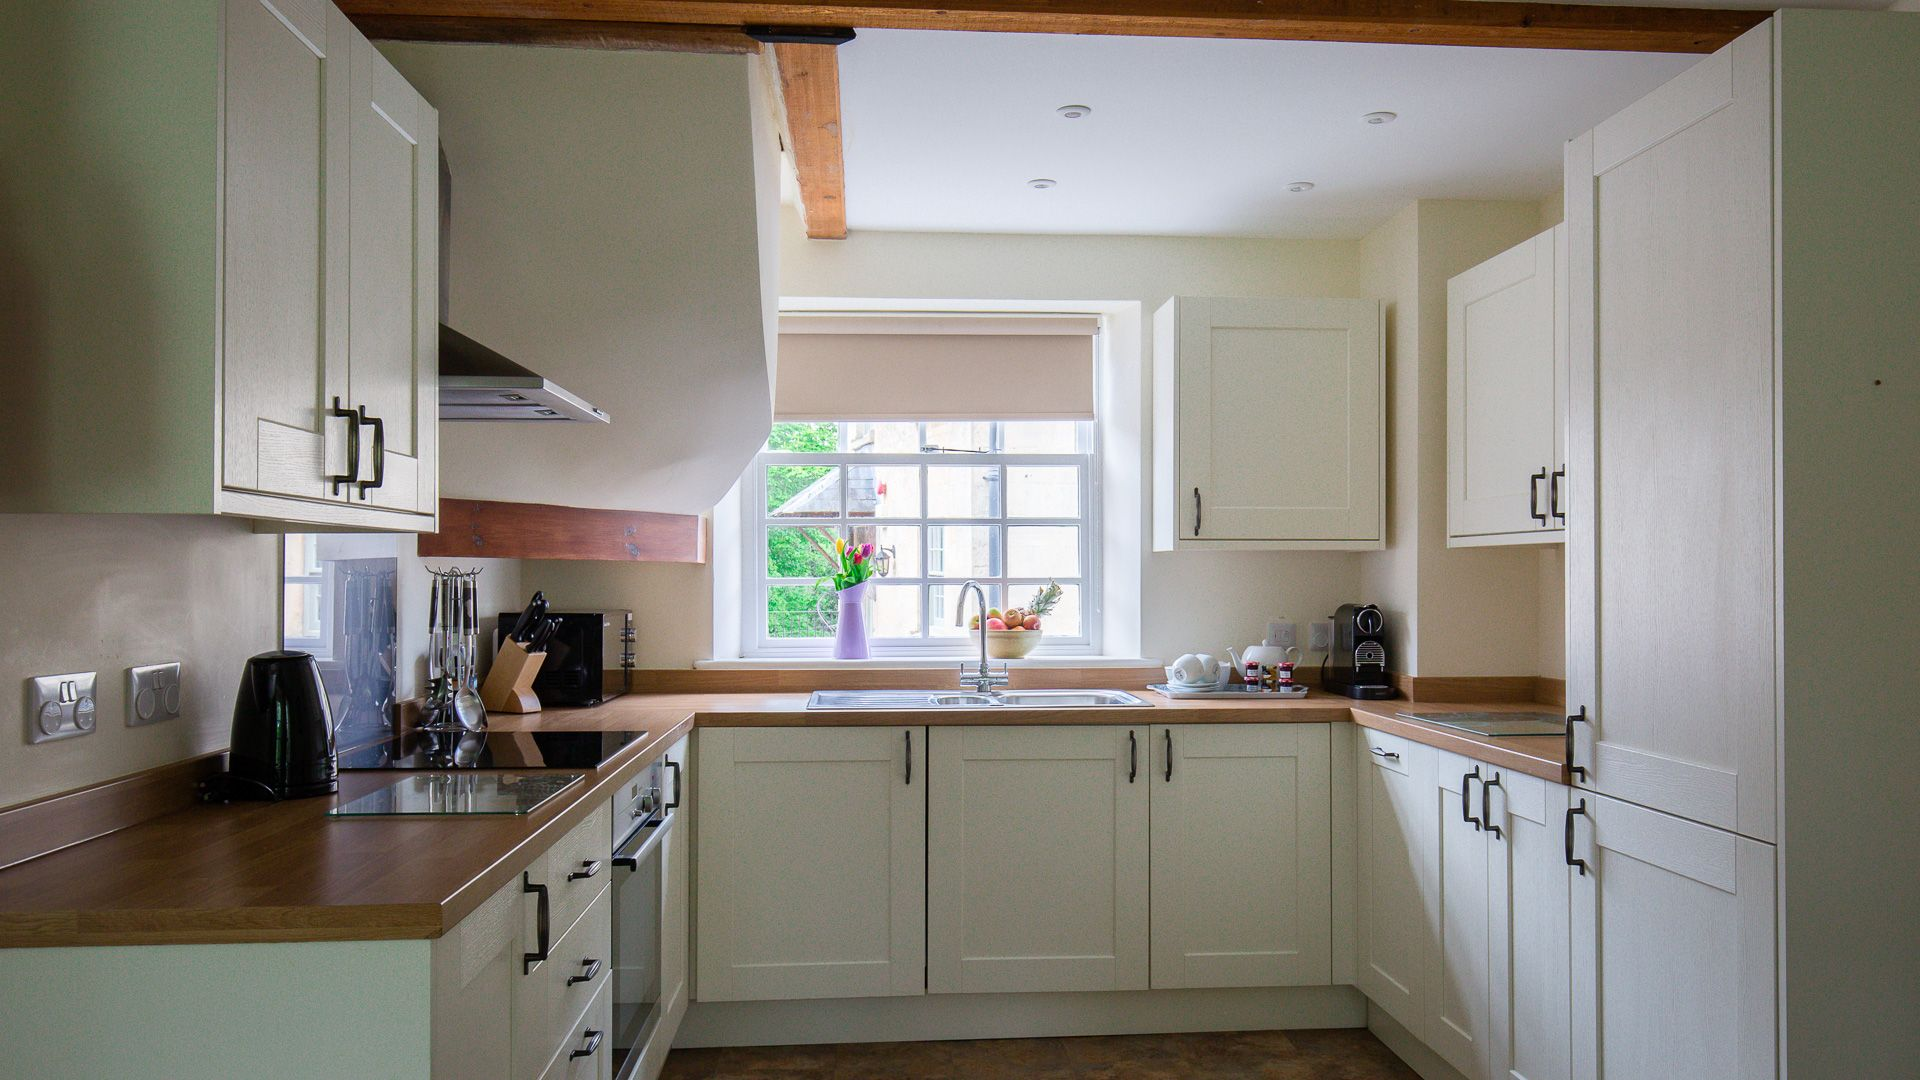 Kitchen, Prince Rupert at Sudeley Castle, Bolthole Retreats